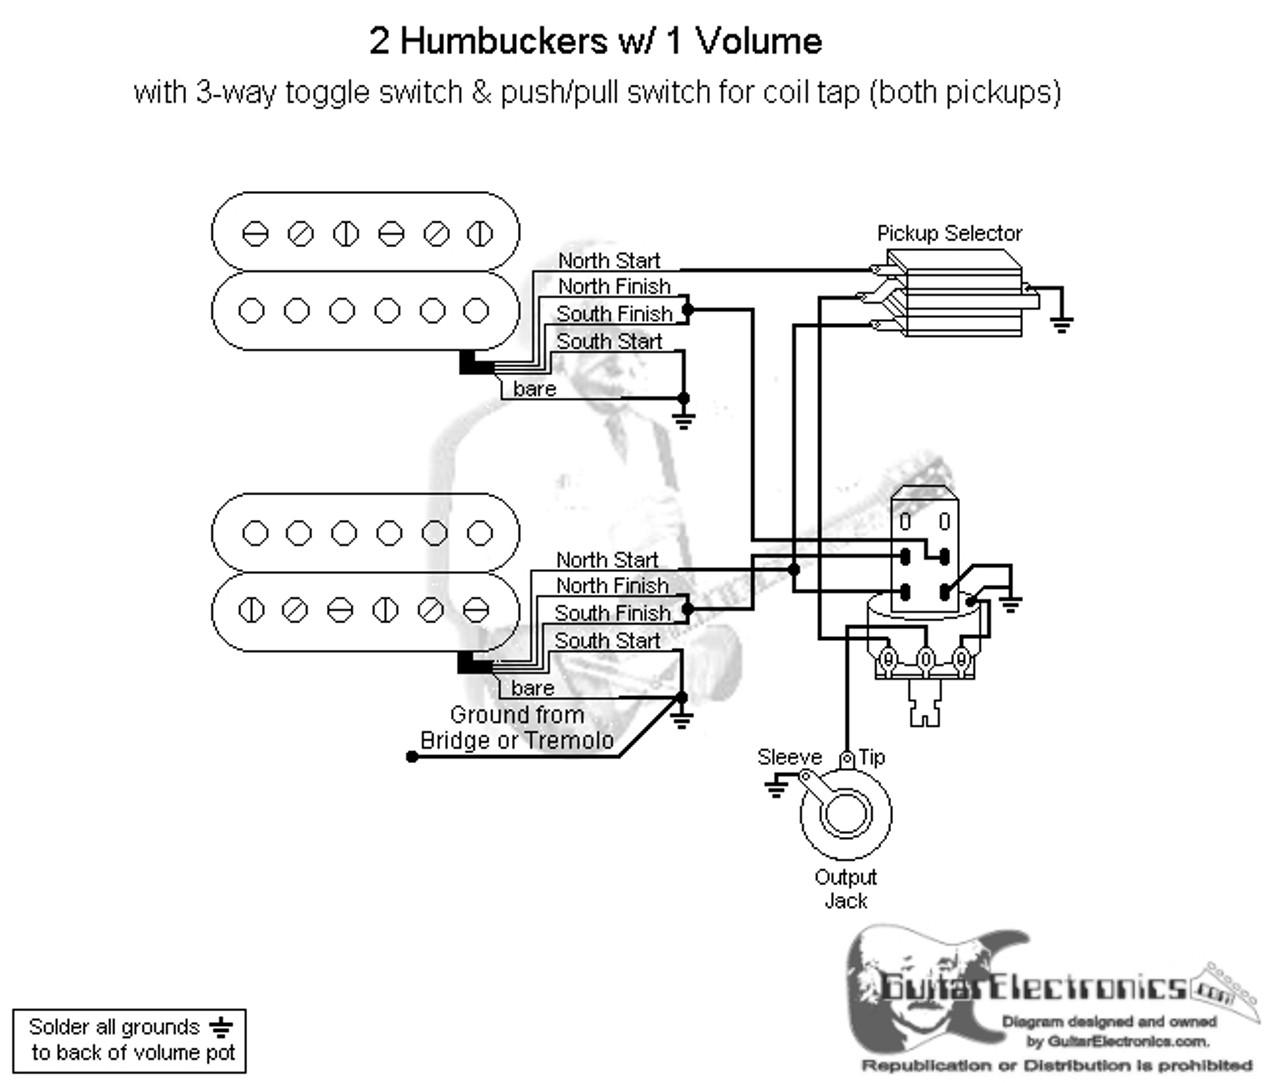 medium resolution of 2 humbuckers 3 way toggle switch 1 volume coil tap northbare knuckle humbucker wiring diagram dual